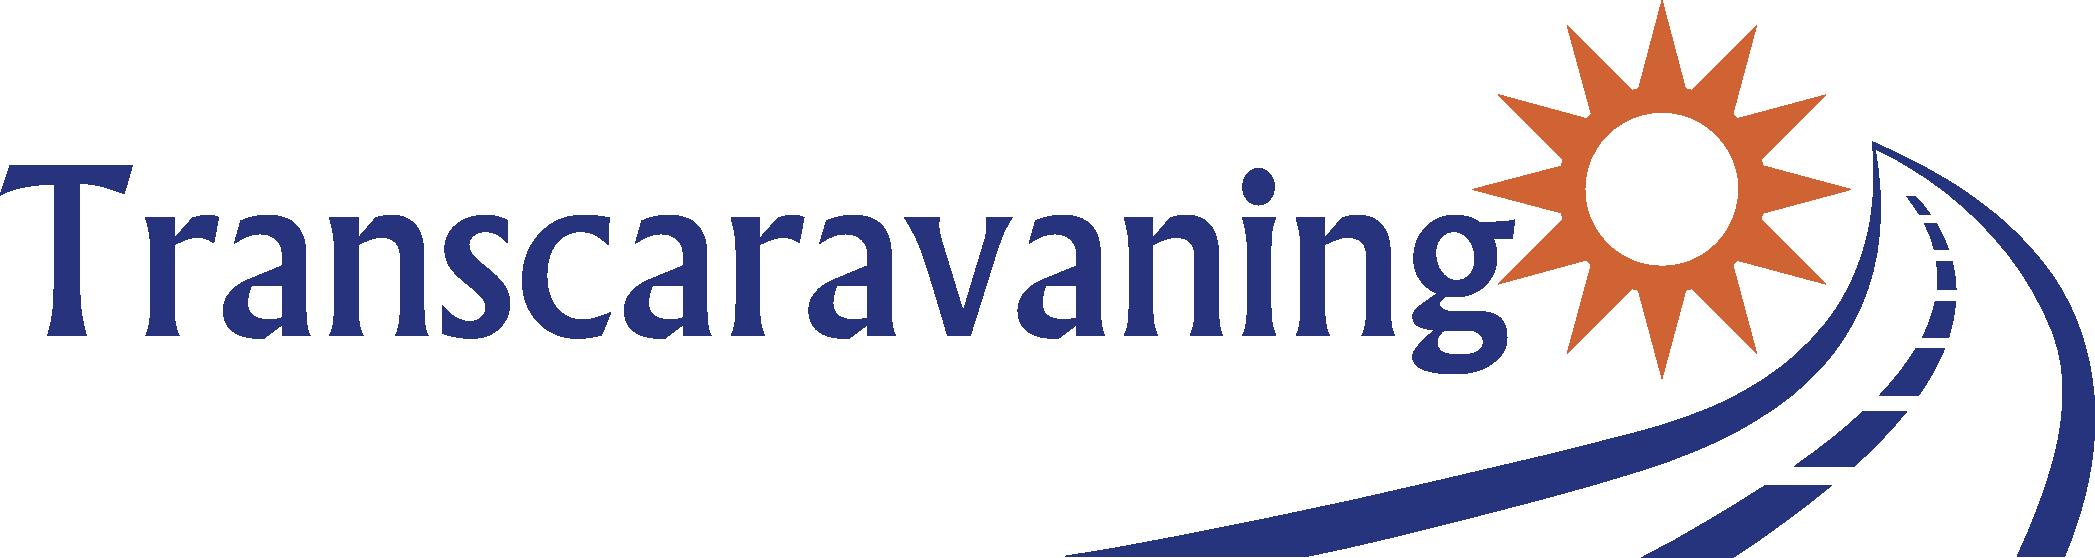 Transcaravaning